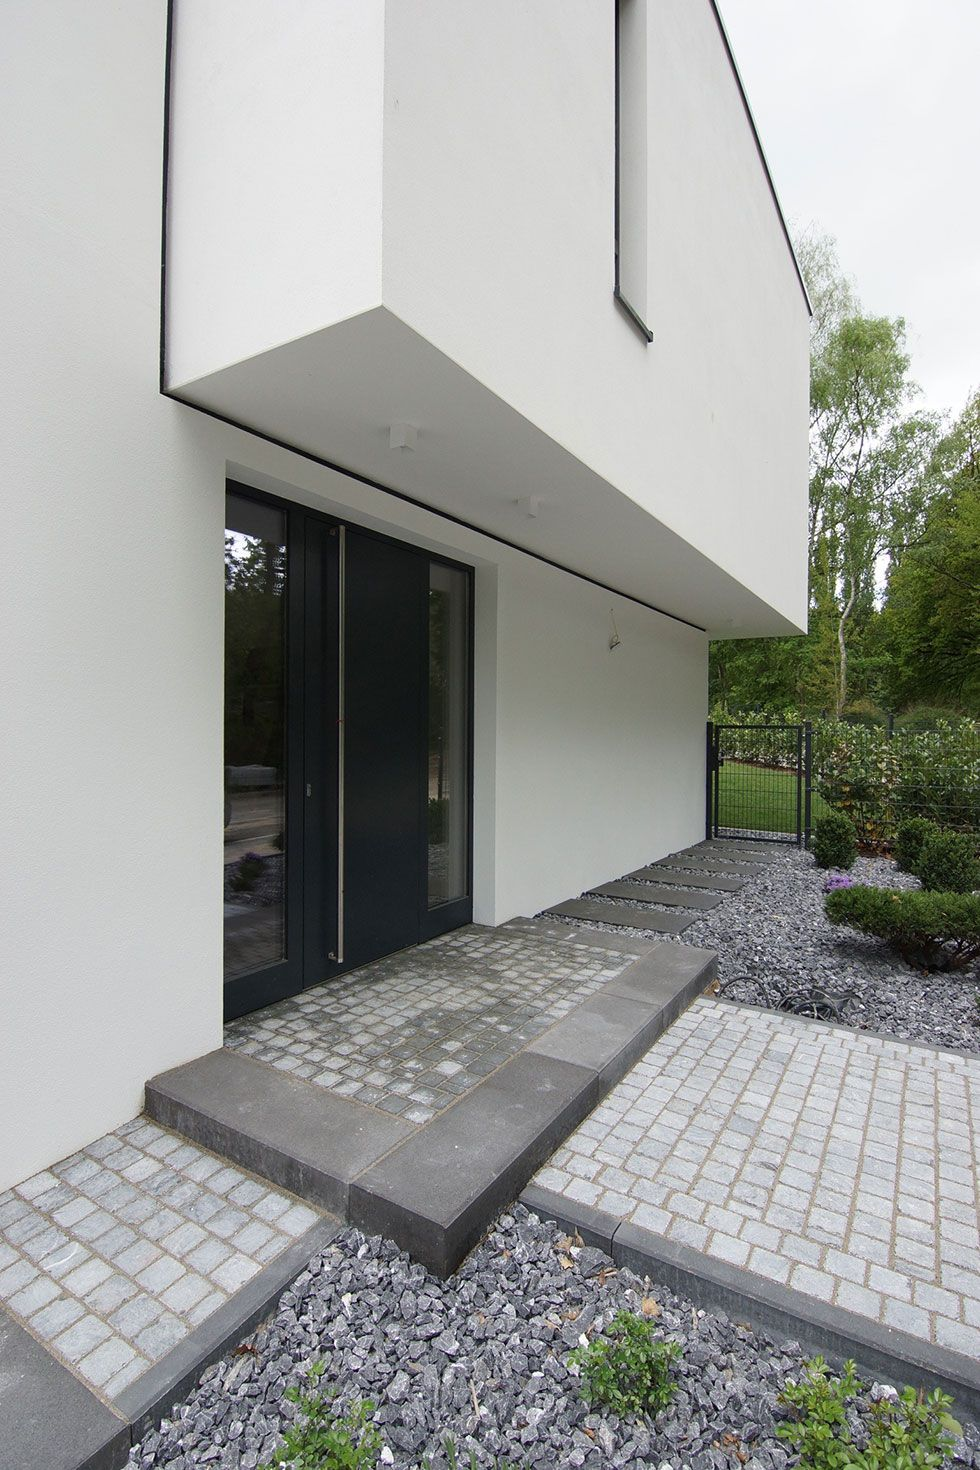 Haus_phl - aprikari GmbH & Co. KG